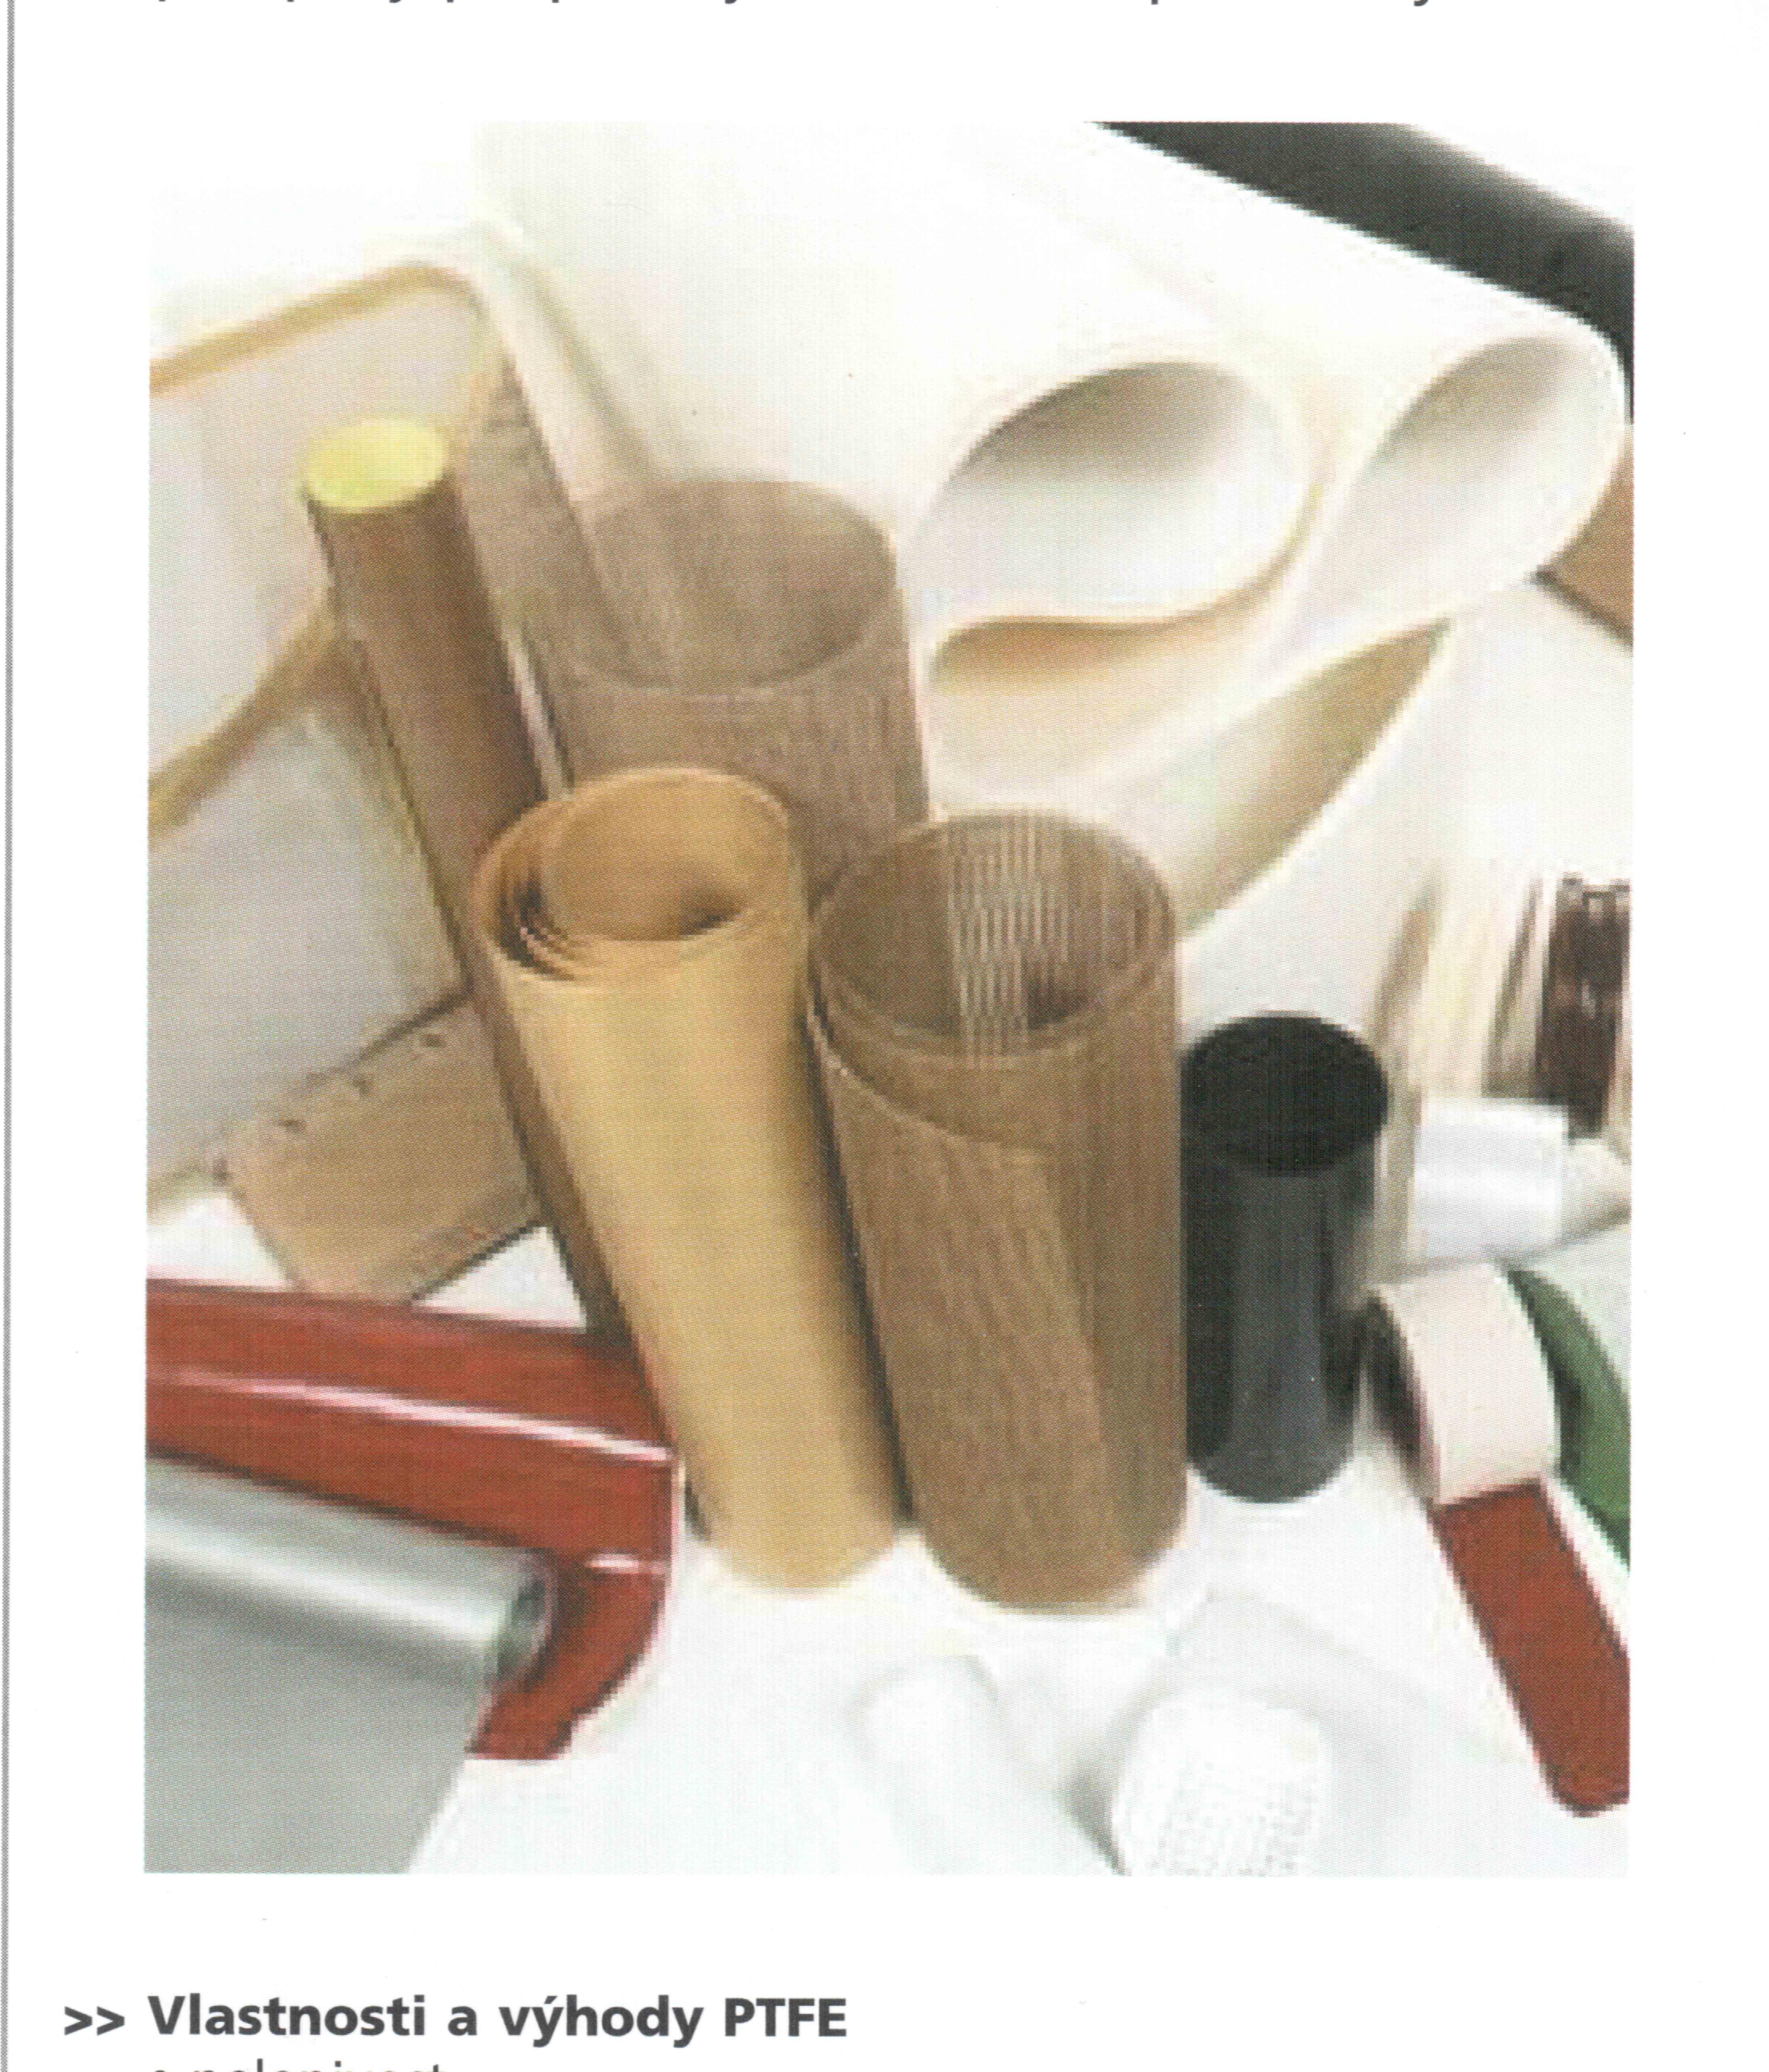 Професионални лепила за плоски ремъци и транспортни ленти